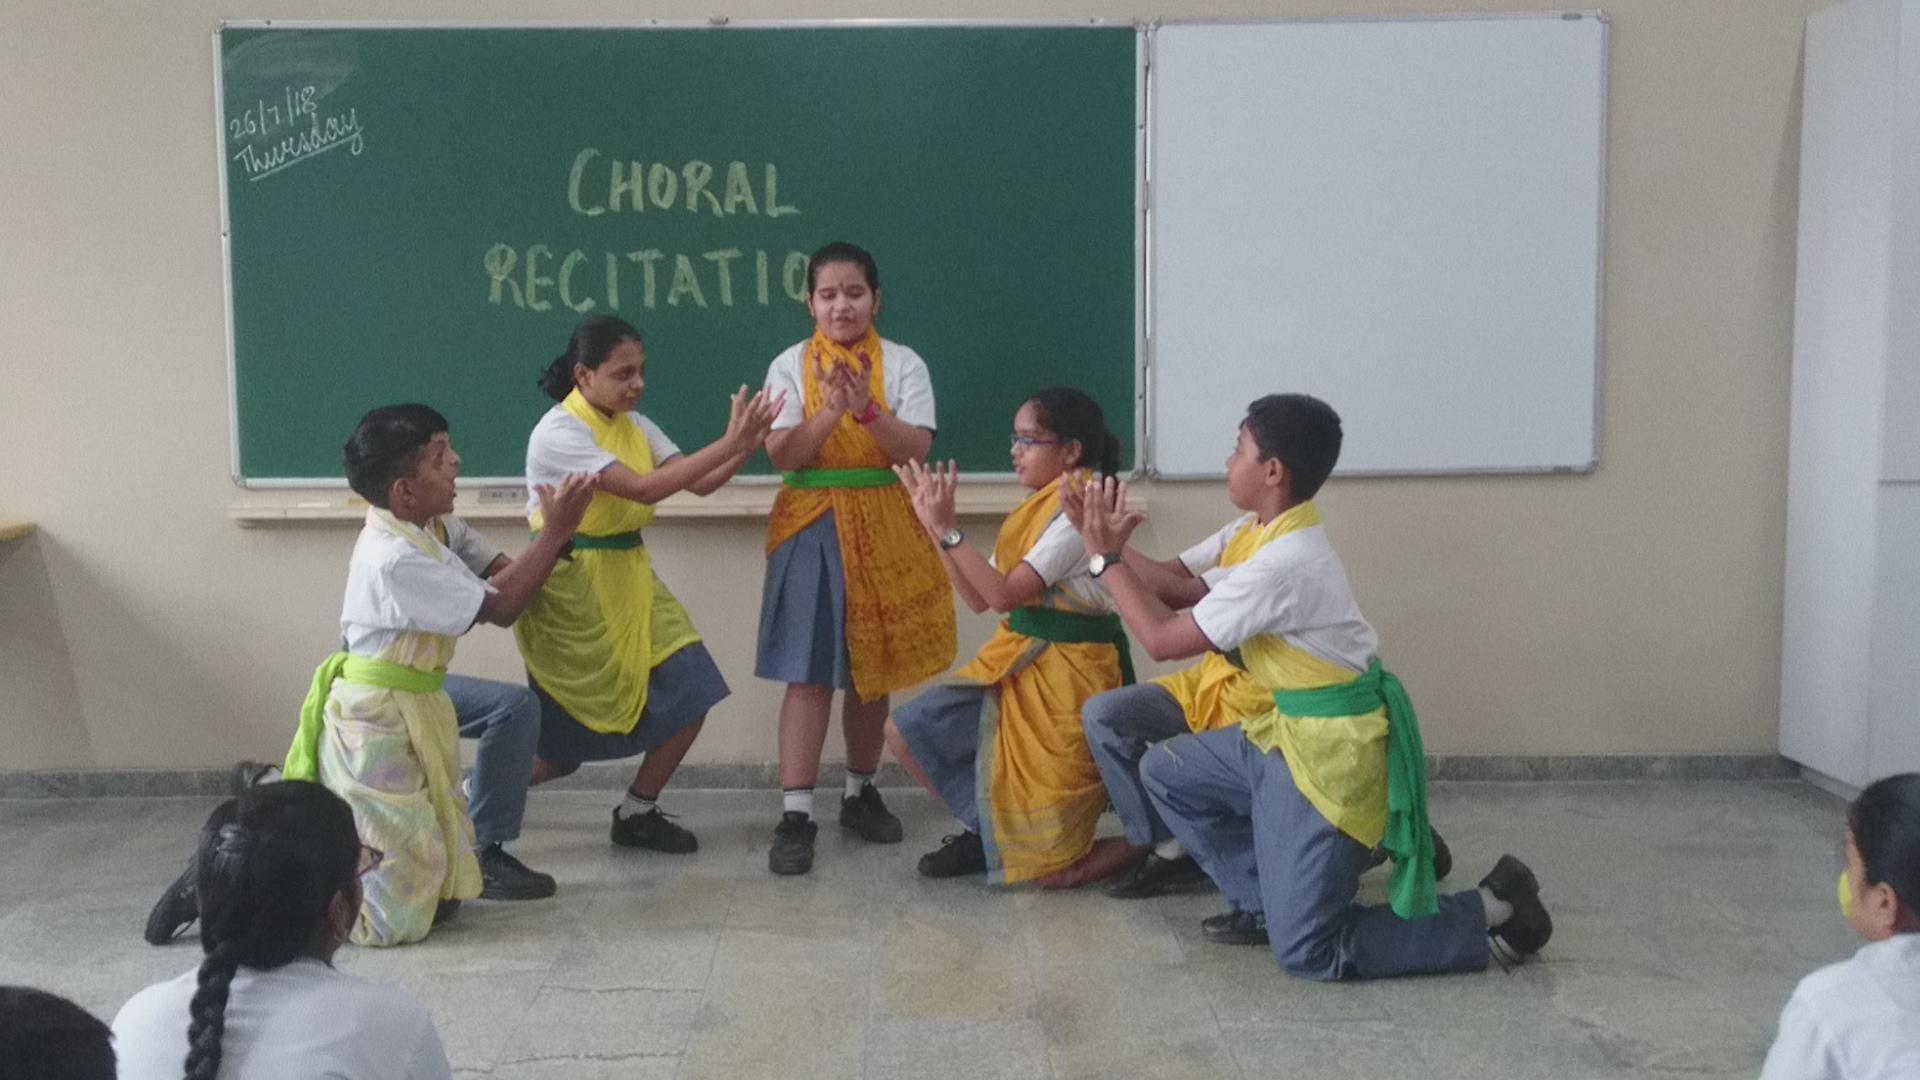 GR-6A Choral recitation (2)